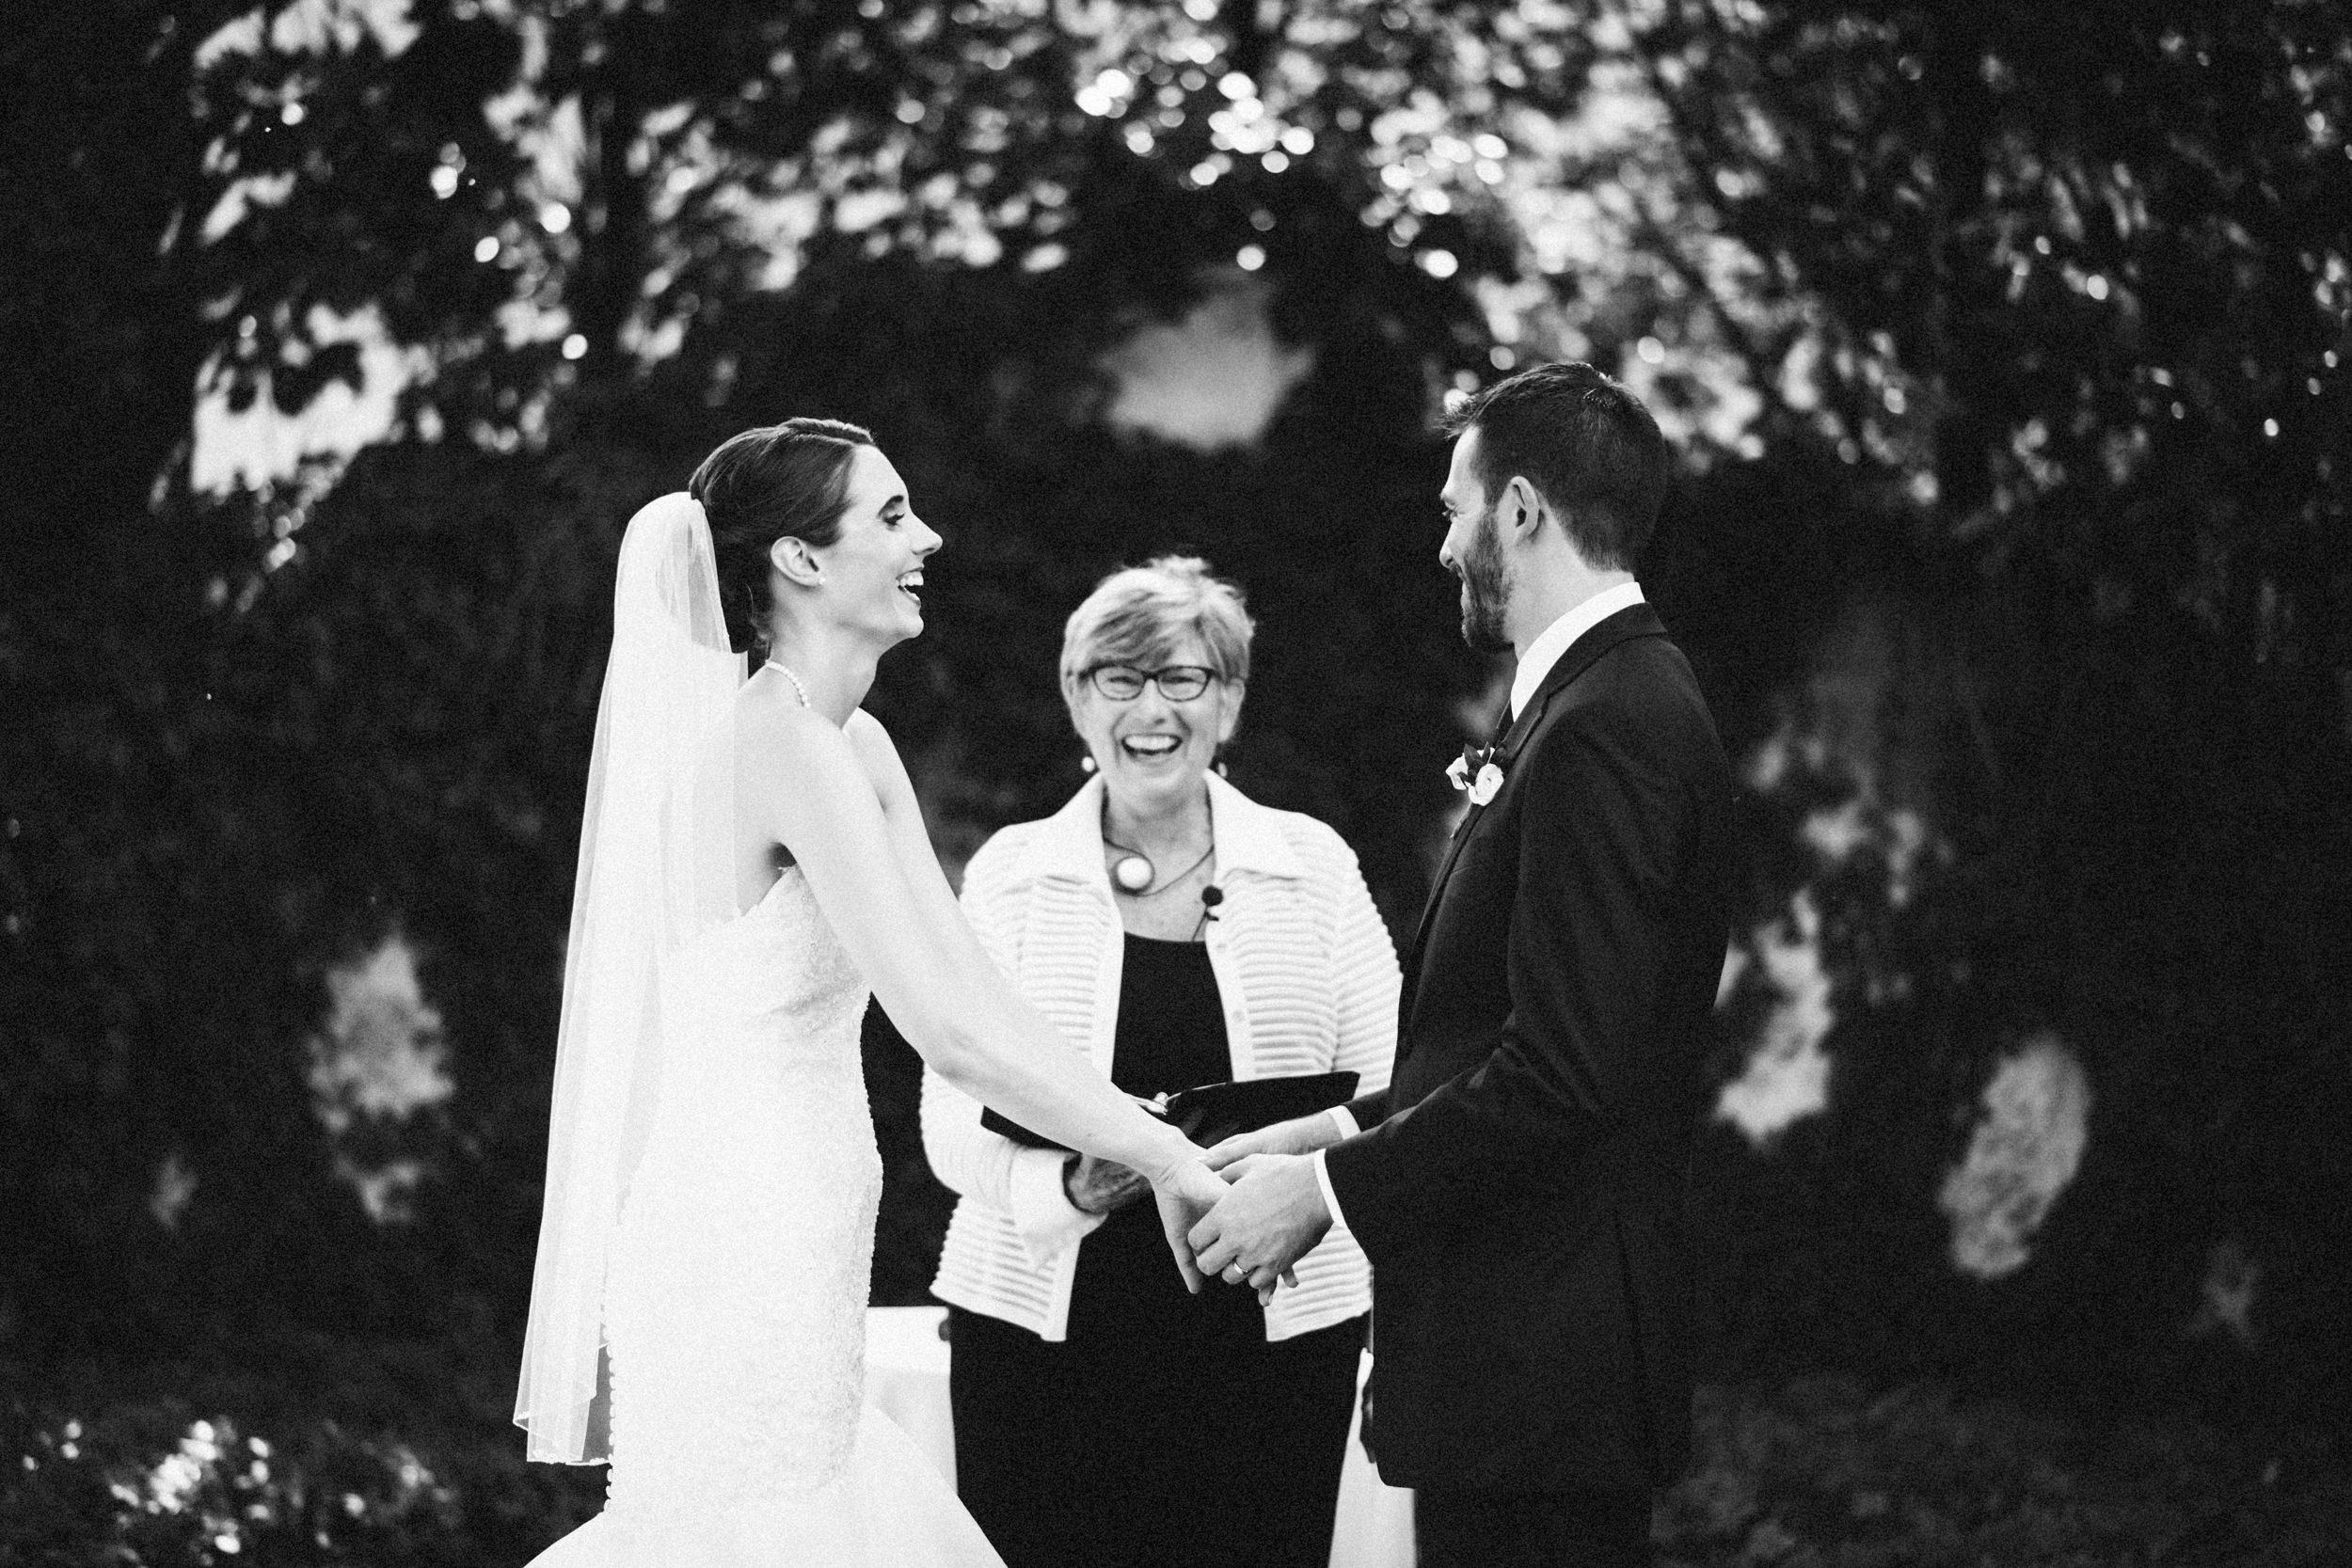 Louisville-Kentucky-Wedding-Elopement-Photographer-Sarah-Katherine-Davis-Photography-Whitehall-Classic-Timeless-Garden-Wedding-417.jpg